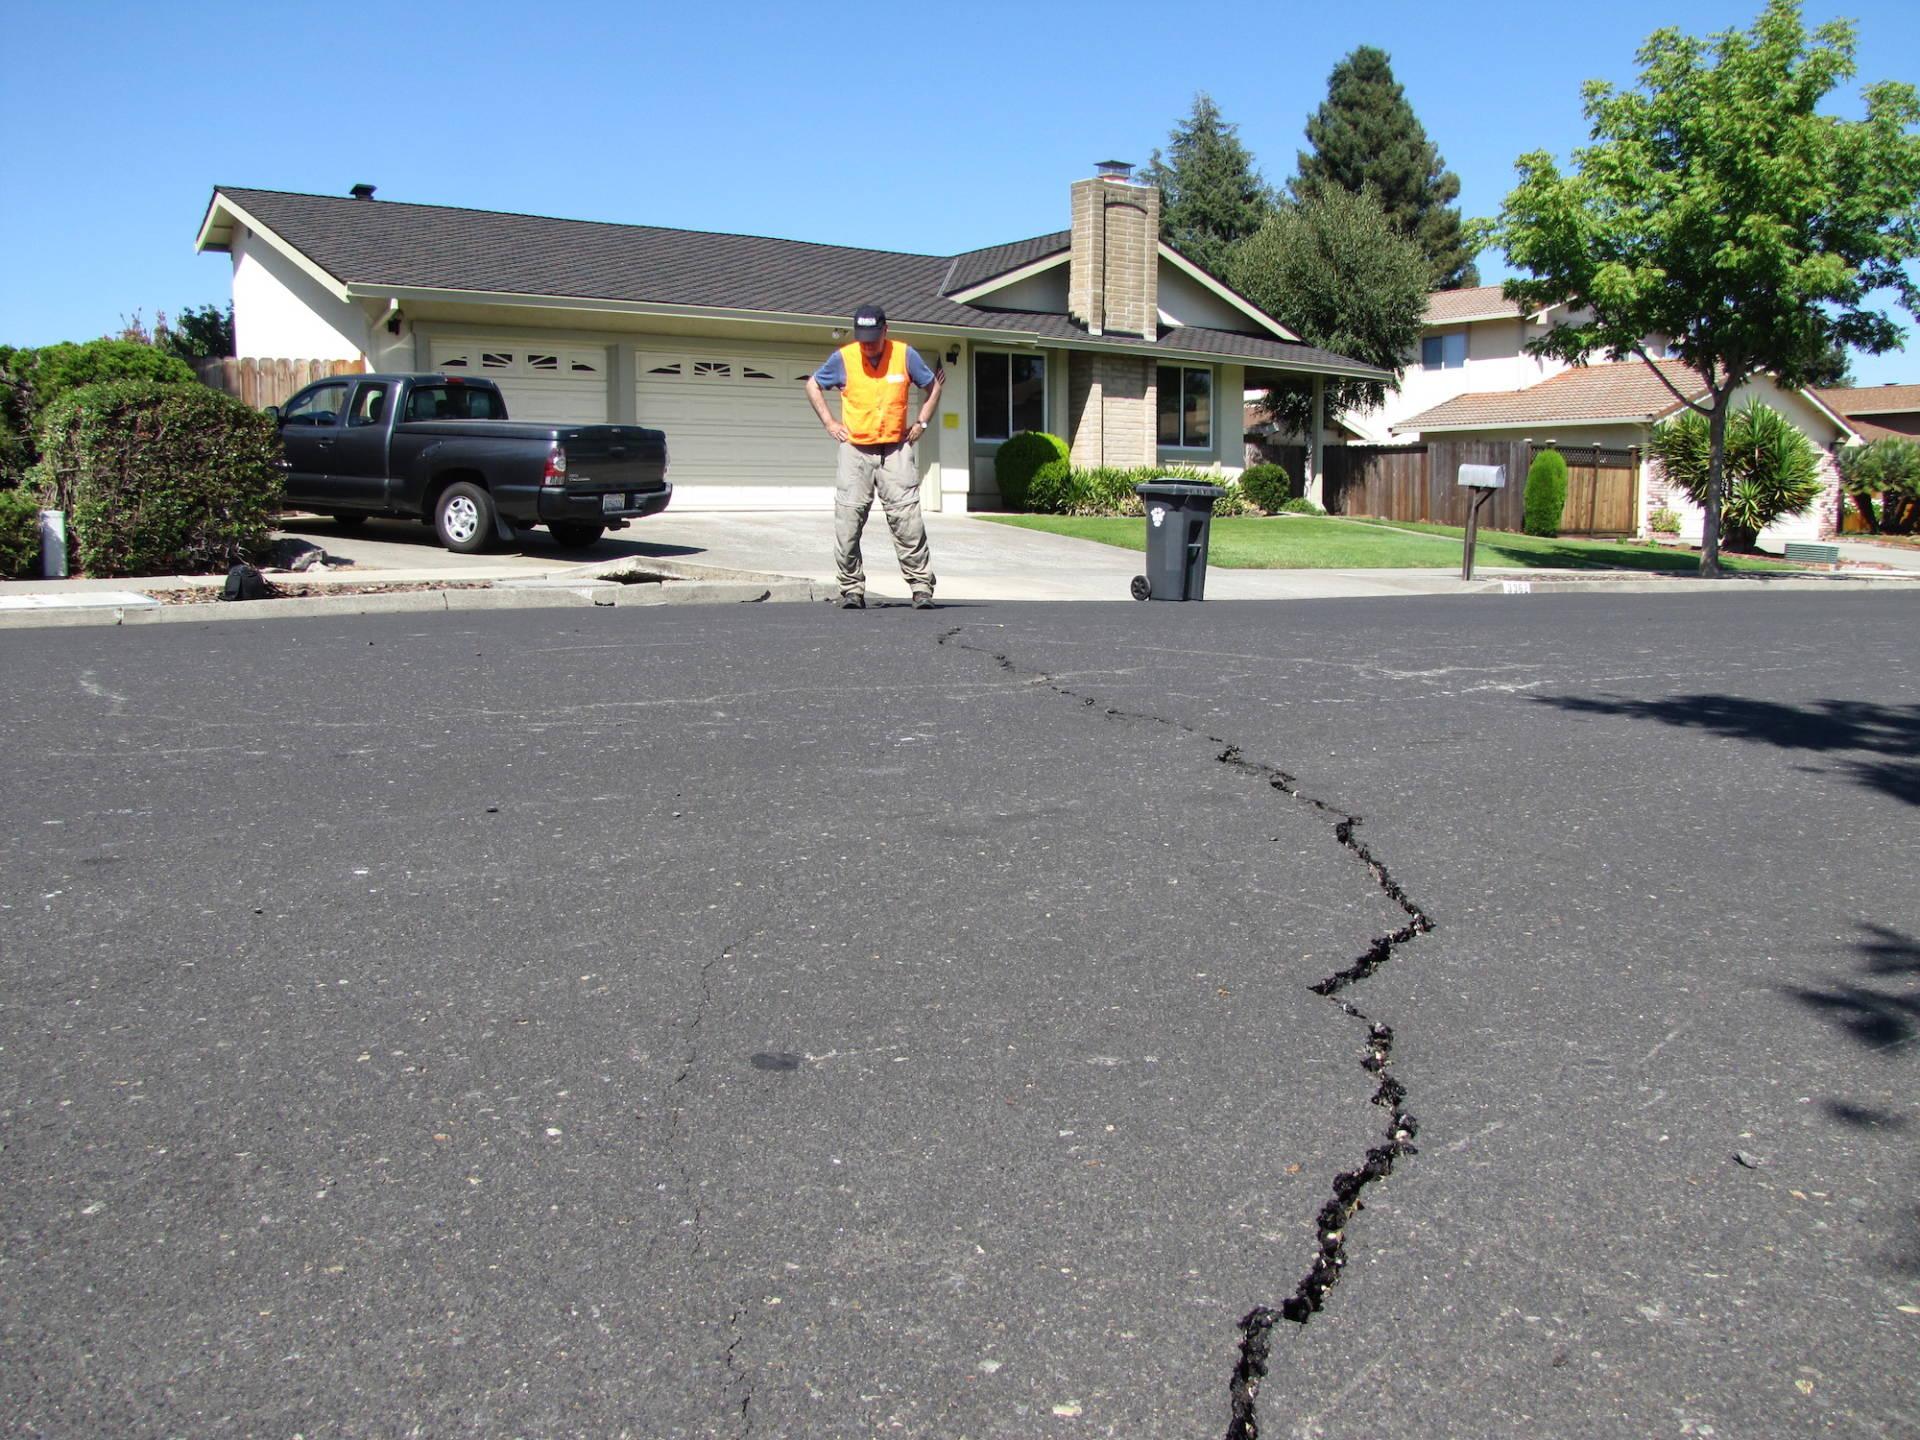 USGS Geologist David Schwartz ponders evidence of fault movement in a west Napa neighborhood.